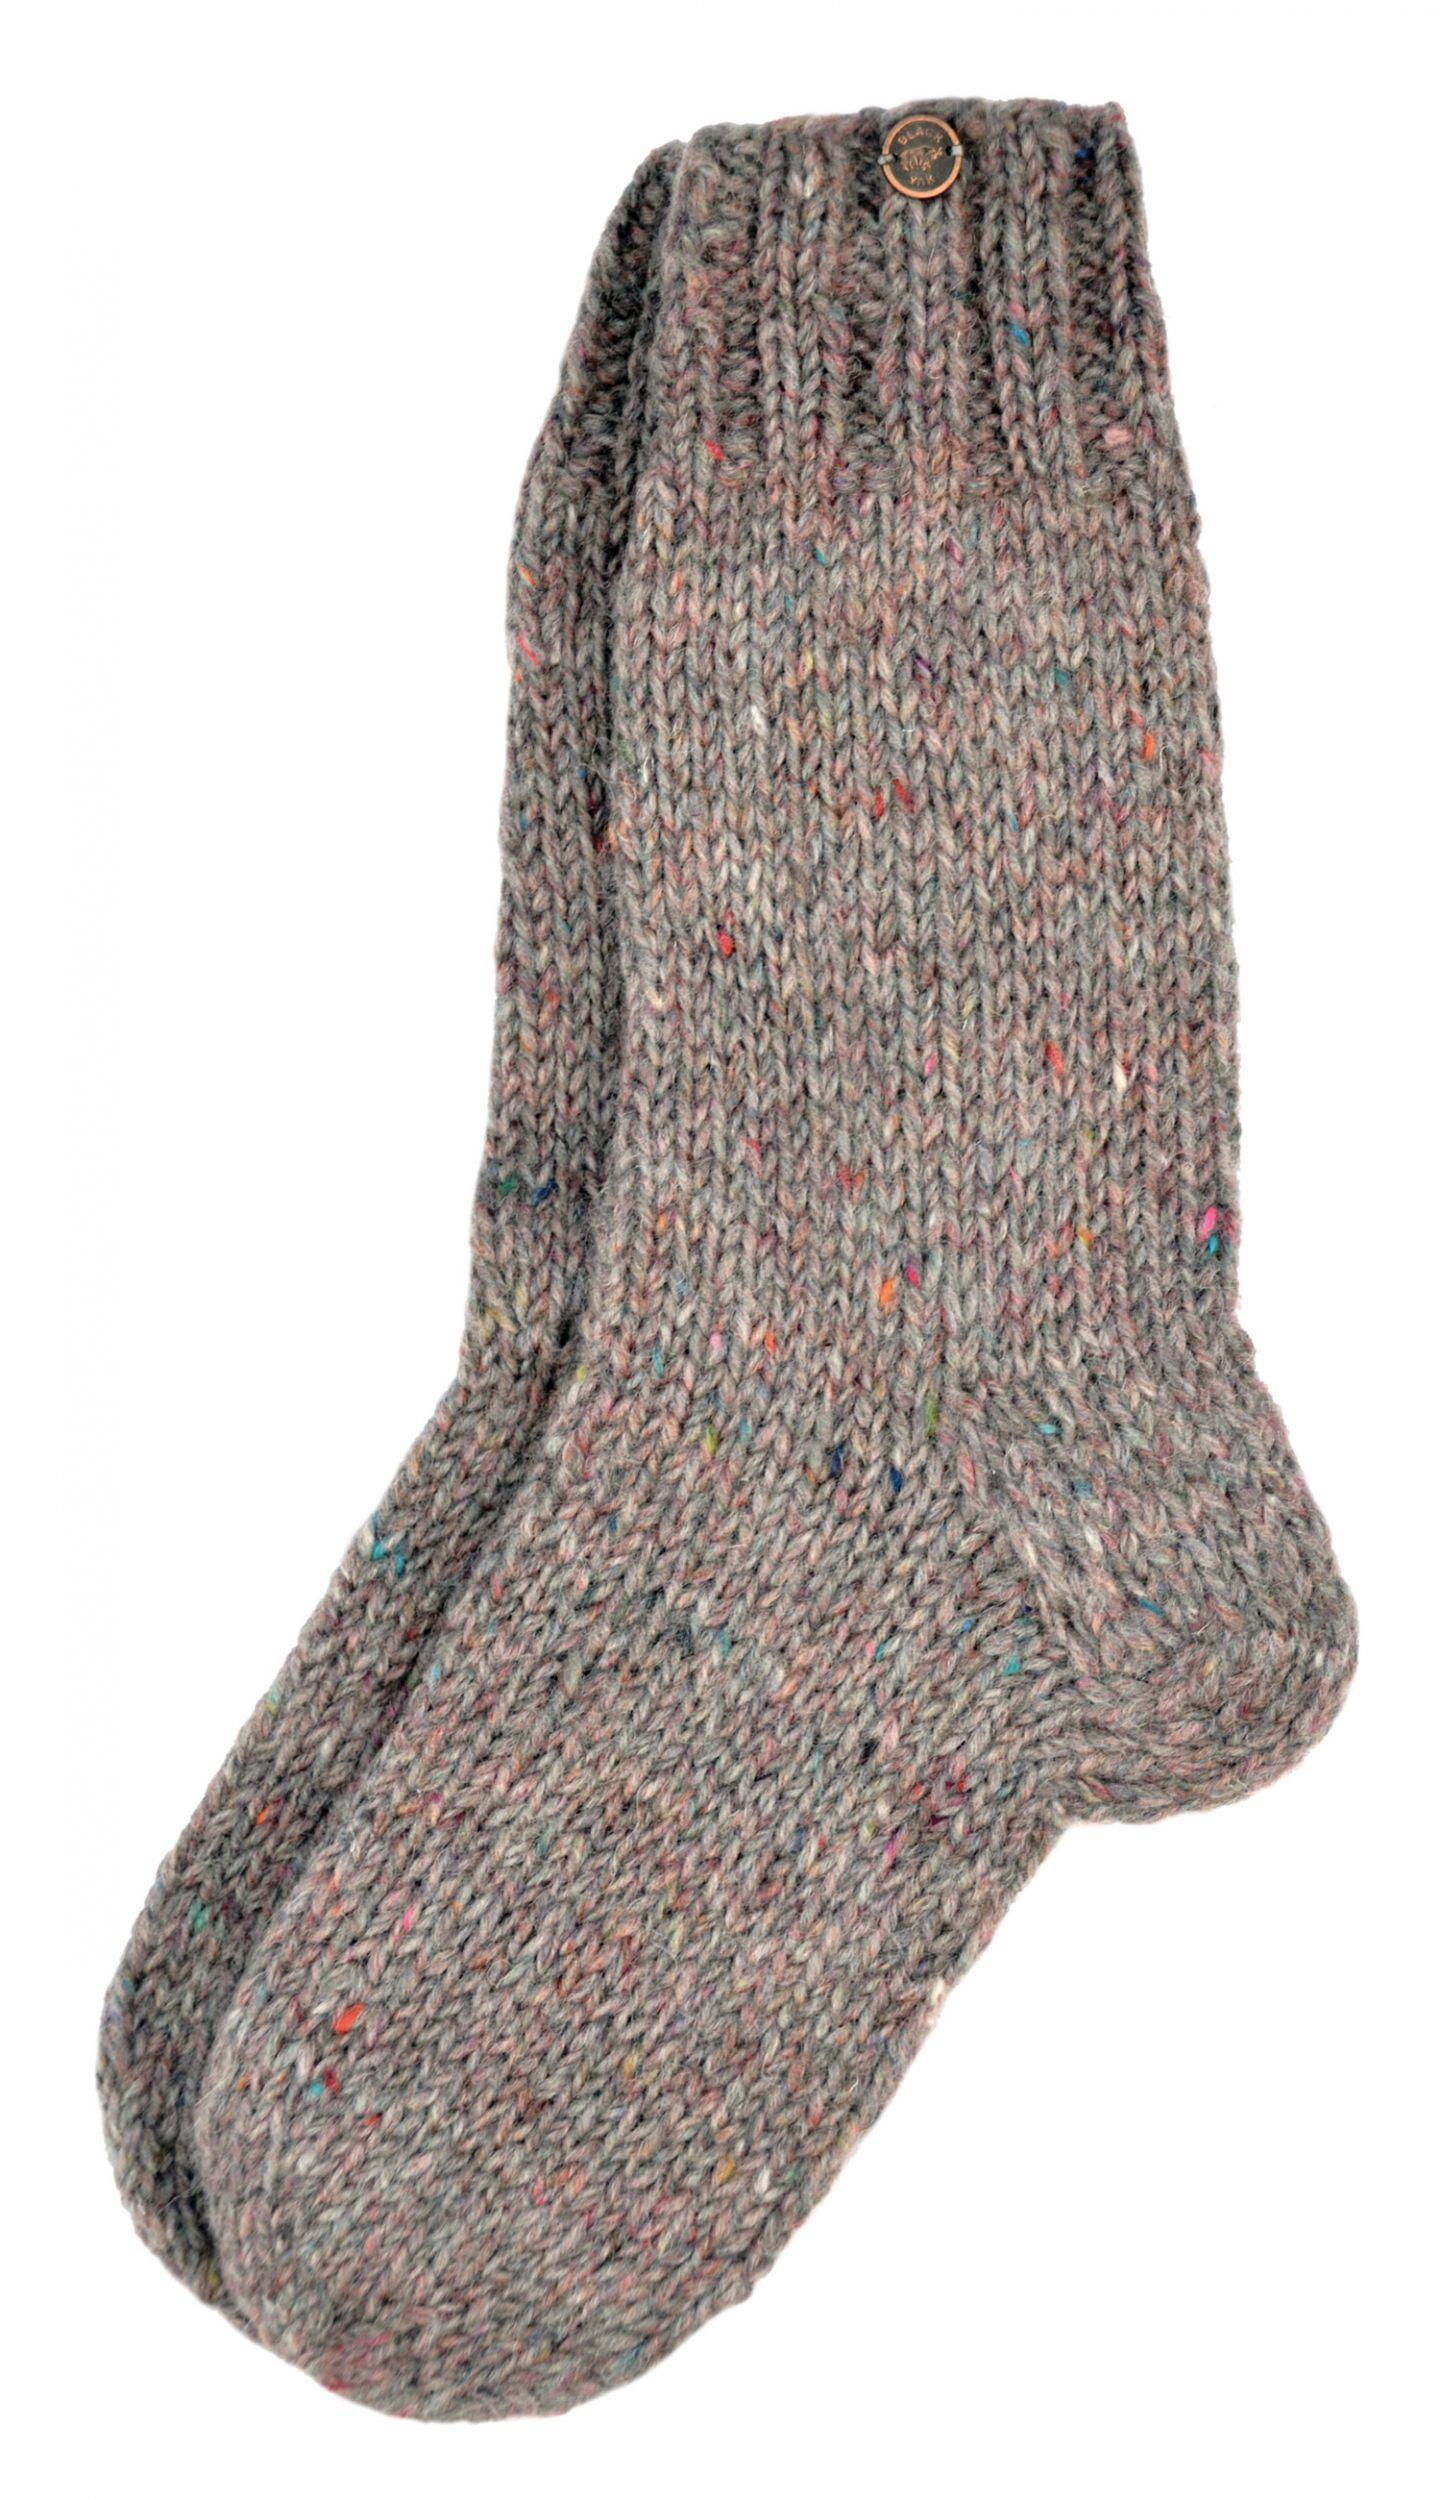 Pure Wool Hand Knit Sock Pale Heather Black Yak